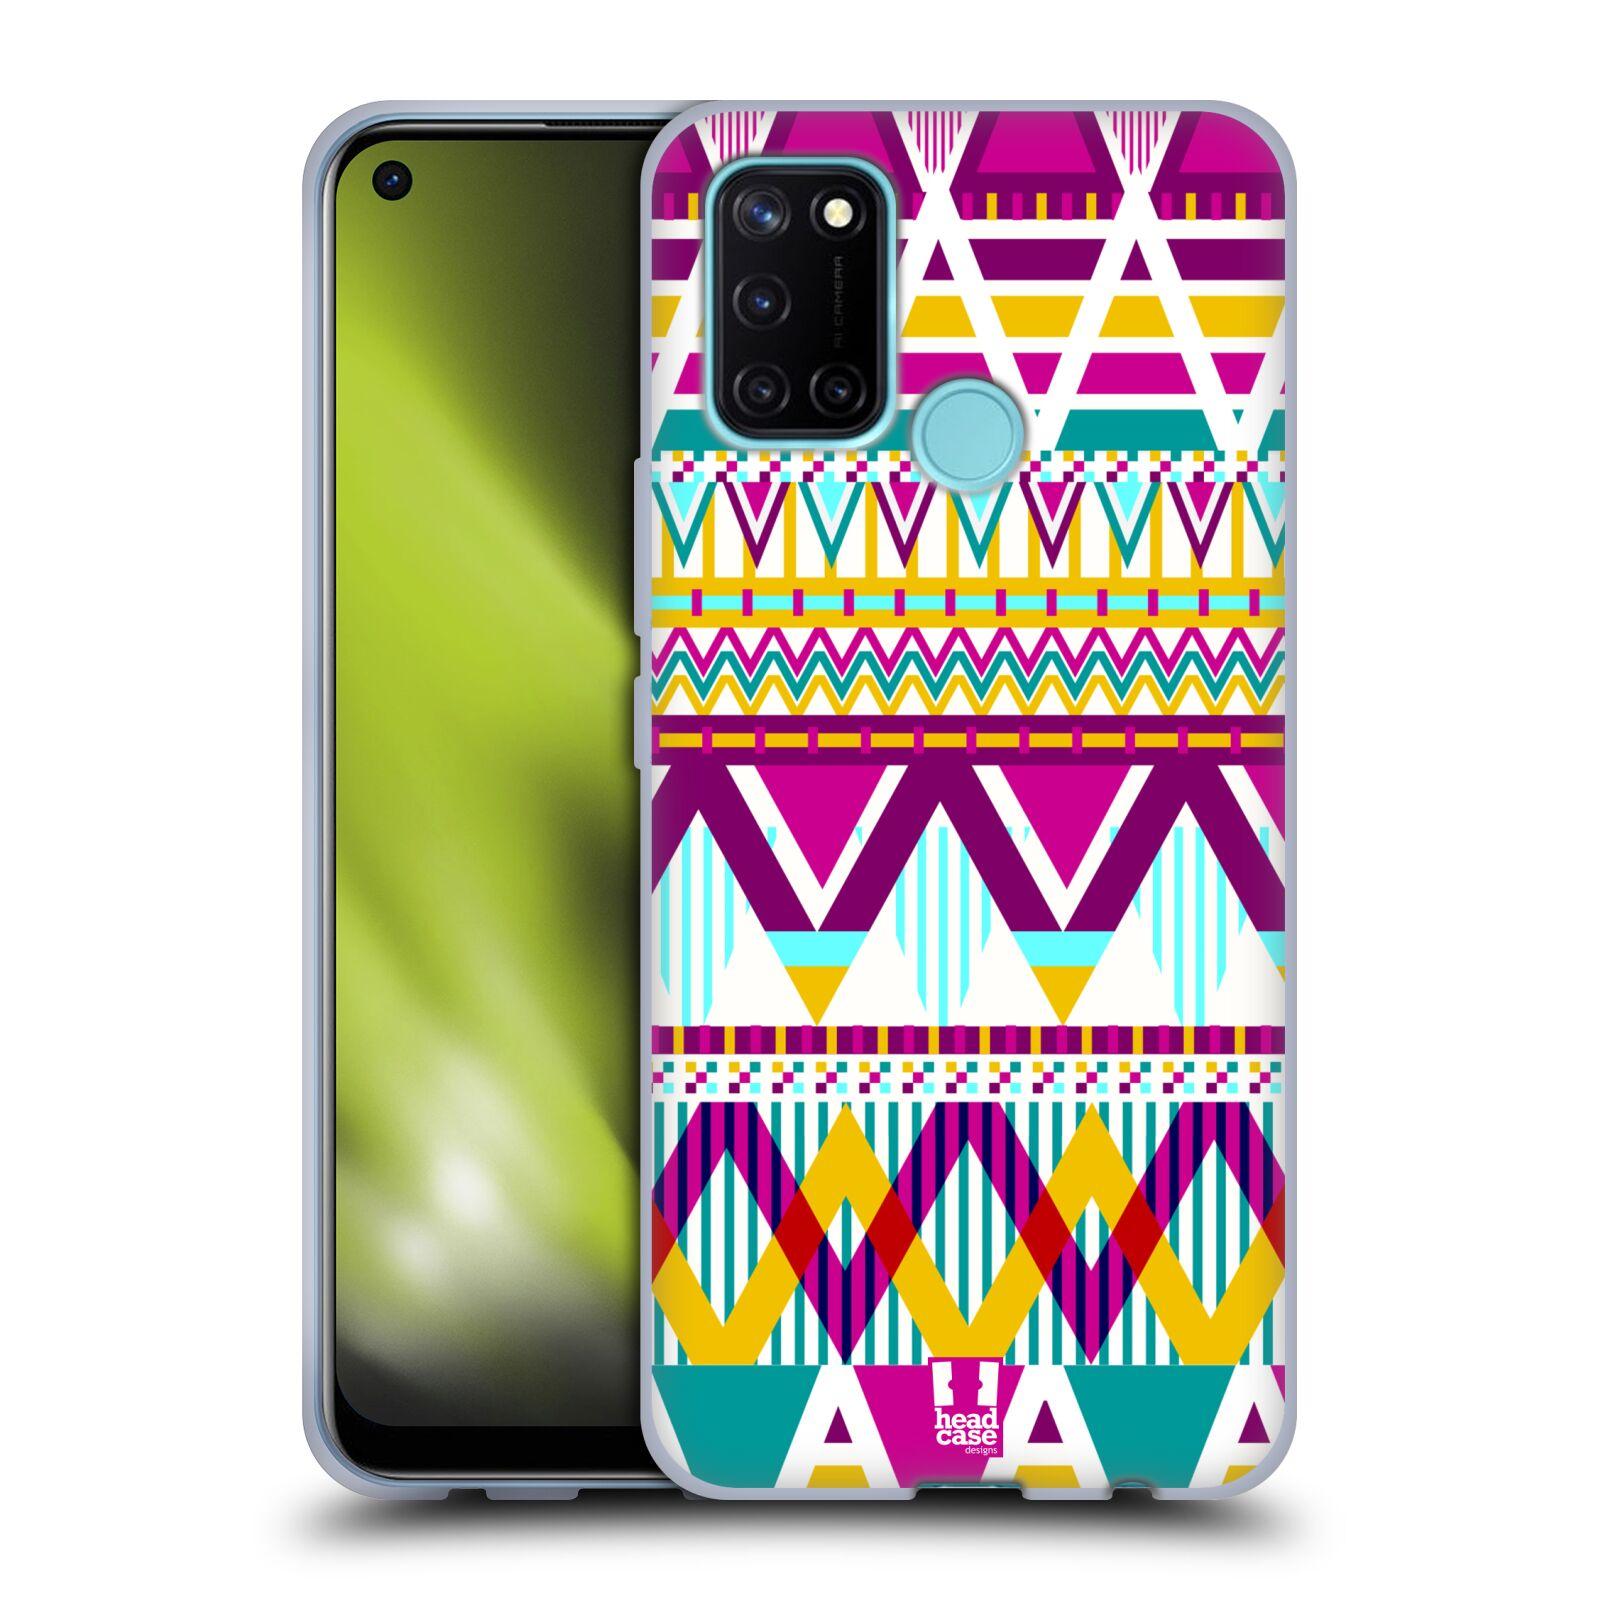 Silikonové pouzdro na mobil Realme 7i - Head Case - AZTEC SUGARED